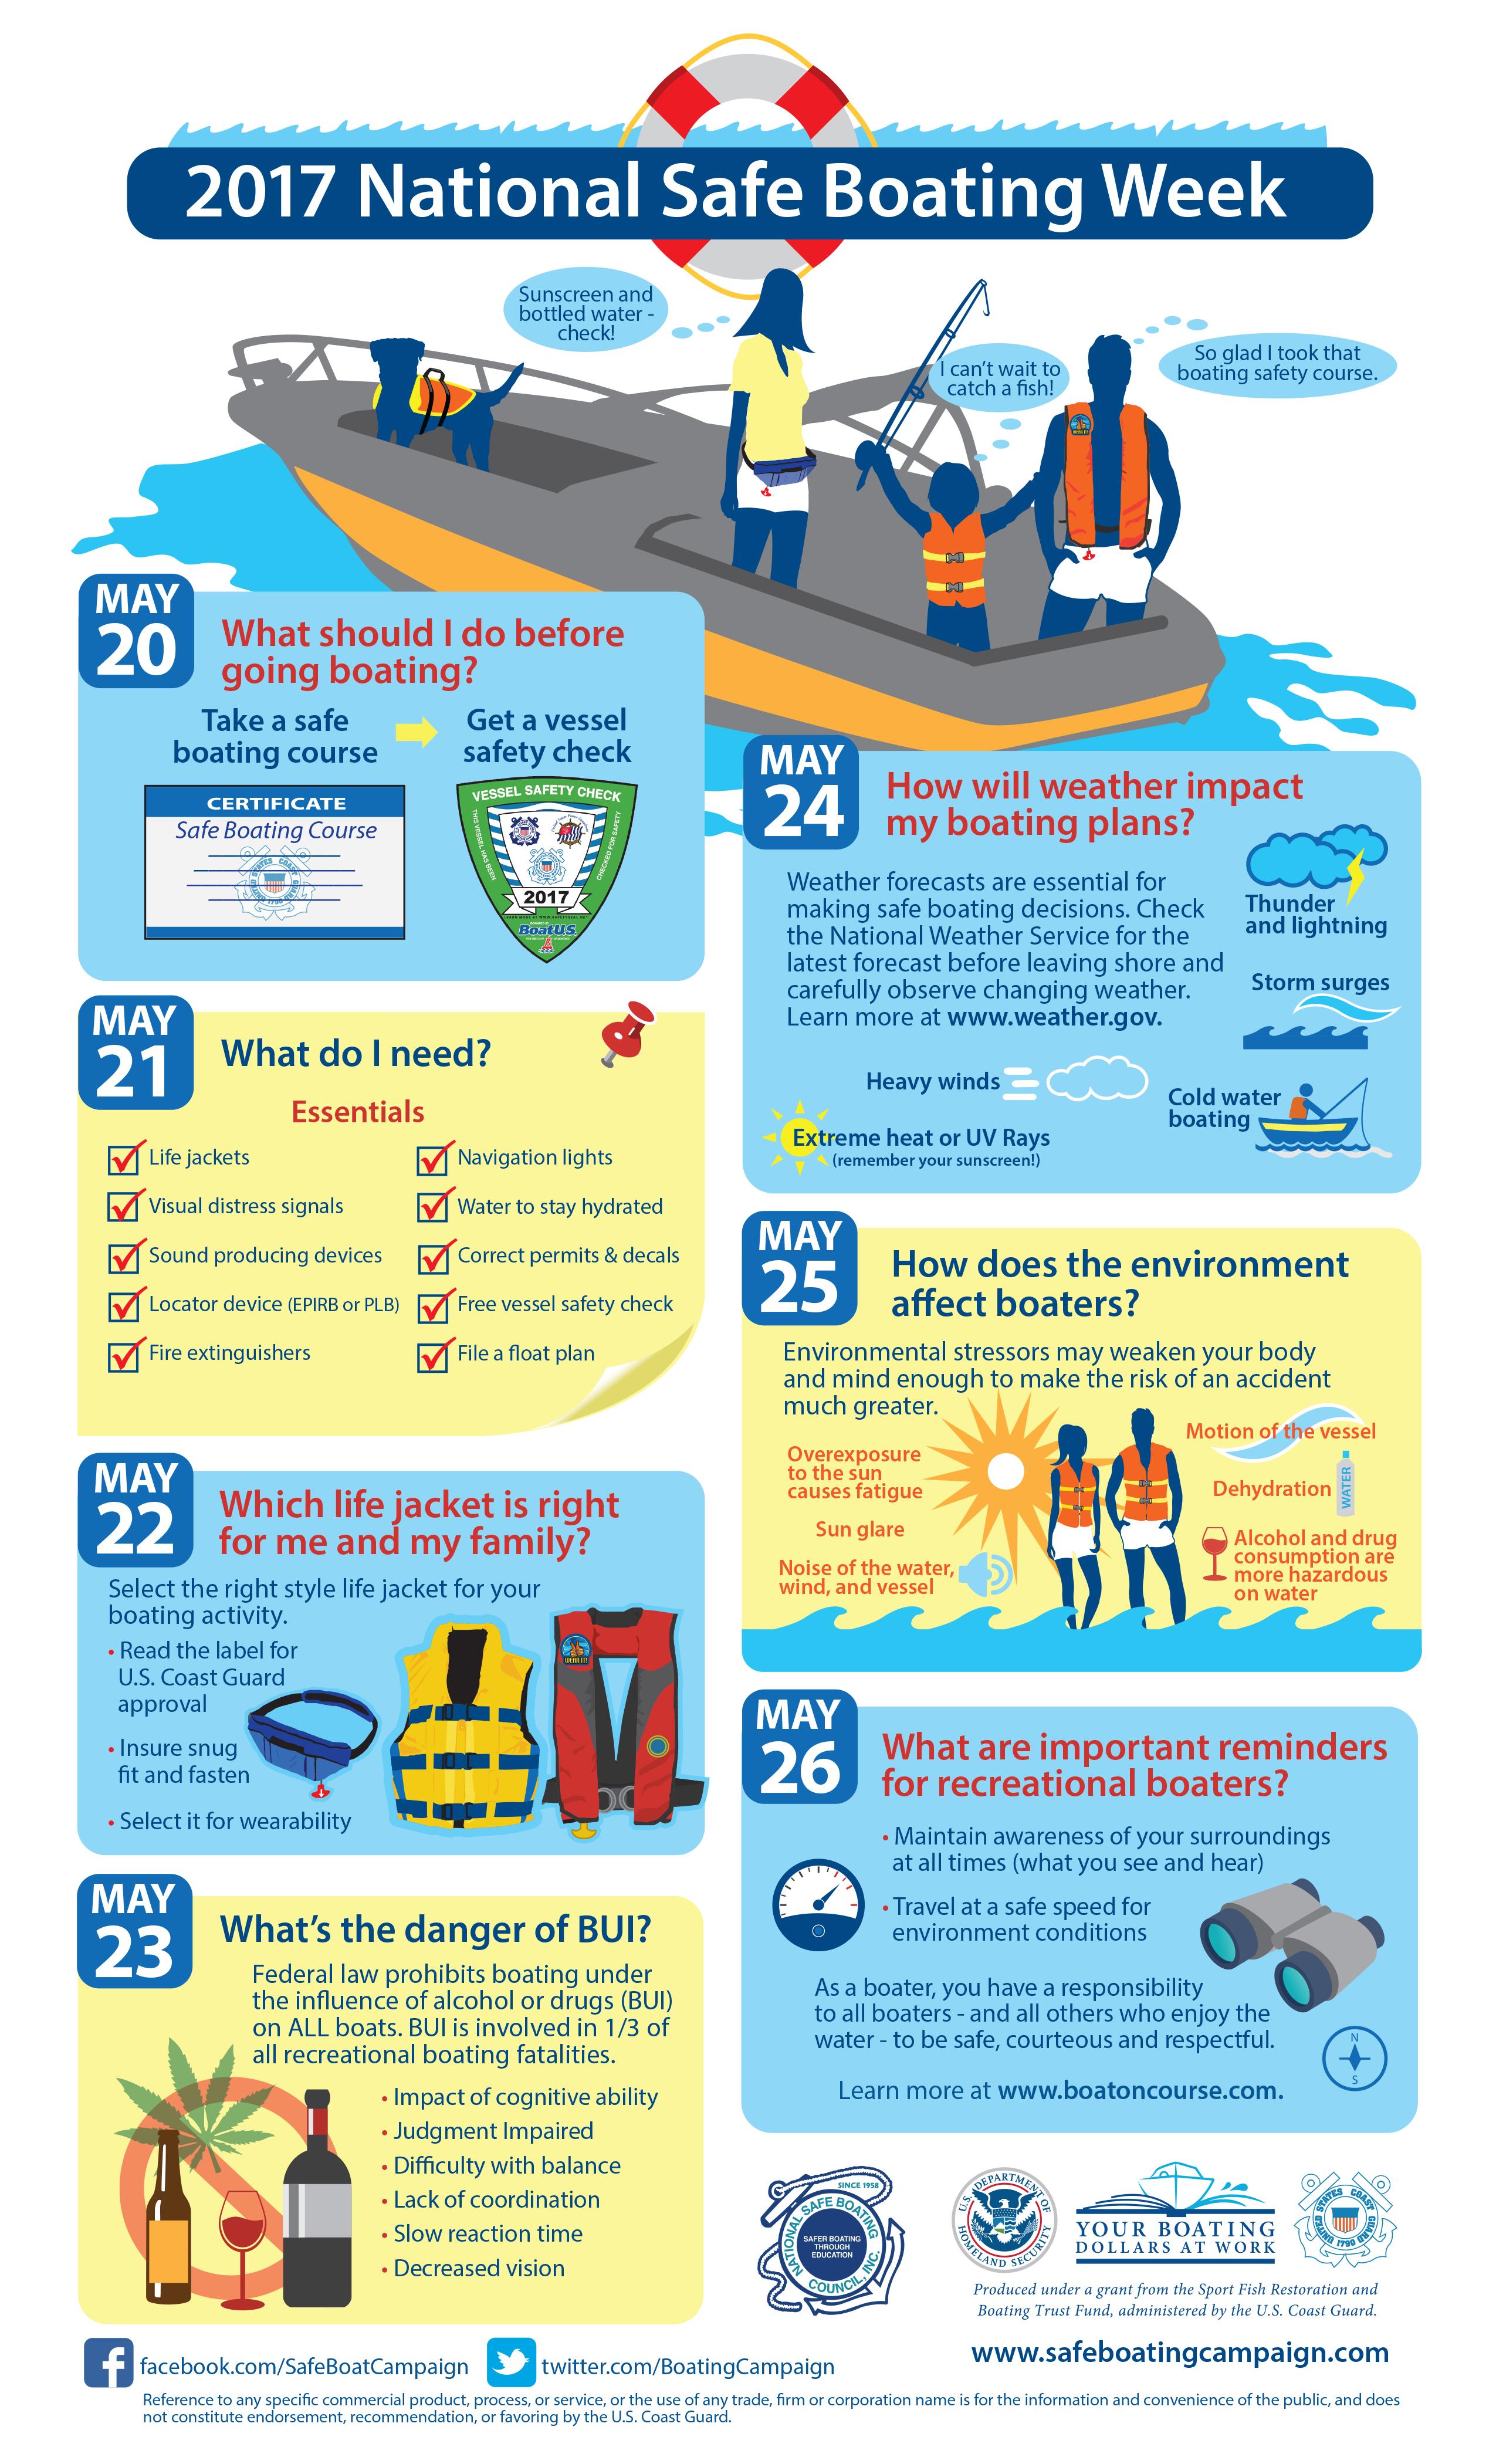 2017-National-Safe-Boating-Week-infographic